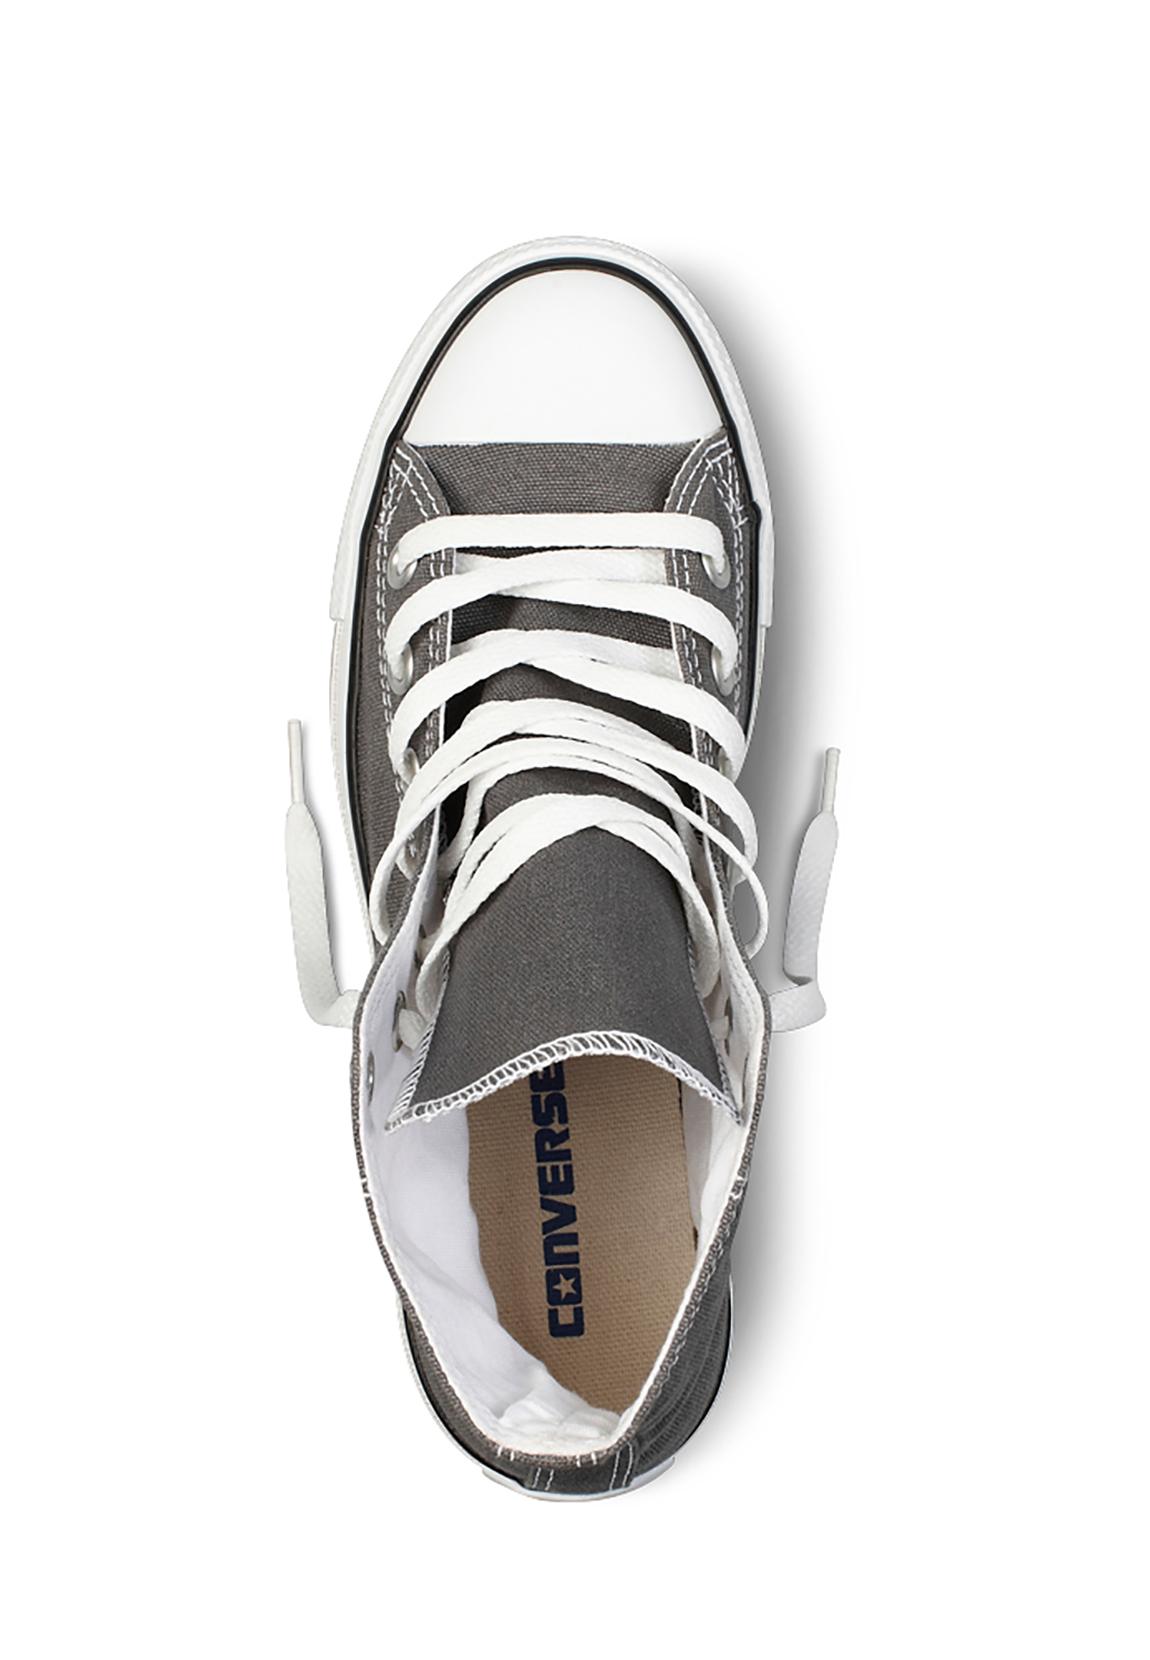 Details about Converse Chucks CT as Seasnl Hi Grey